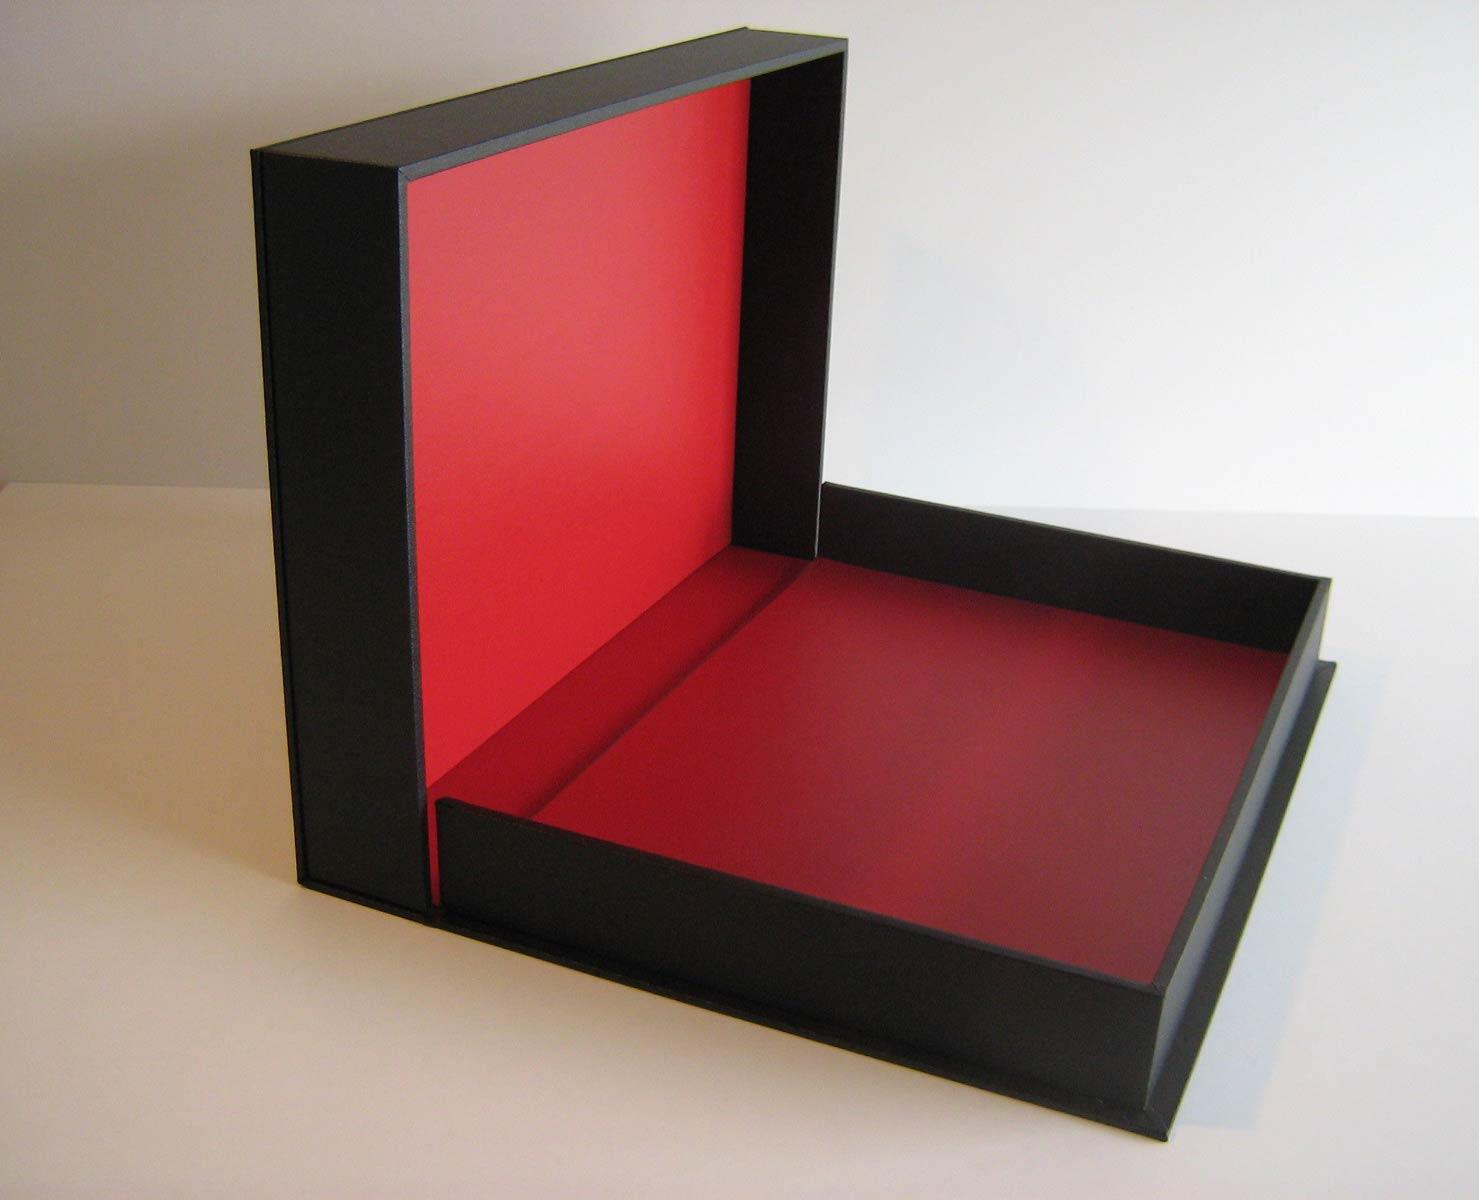 Clam-shell box